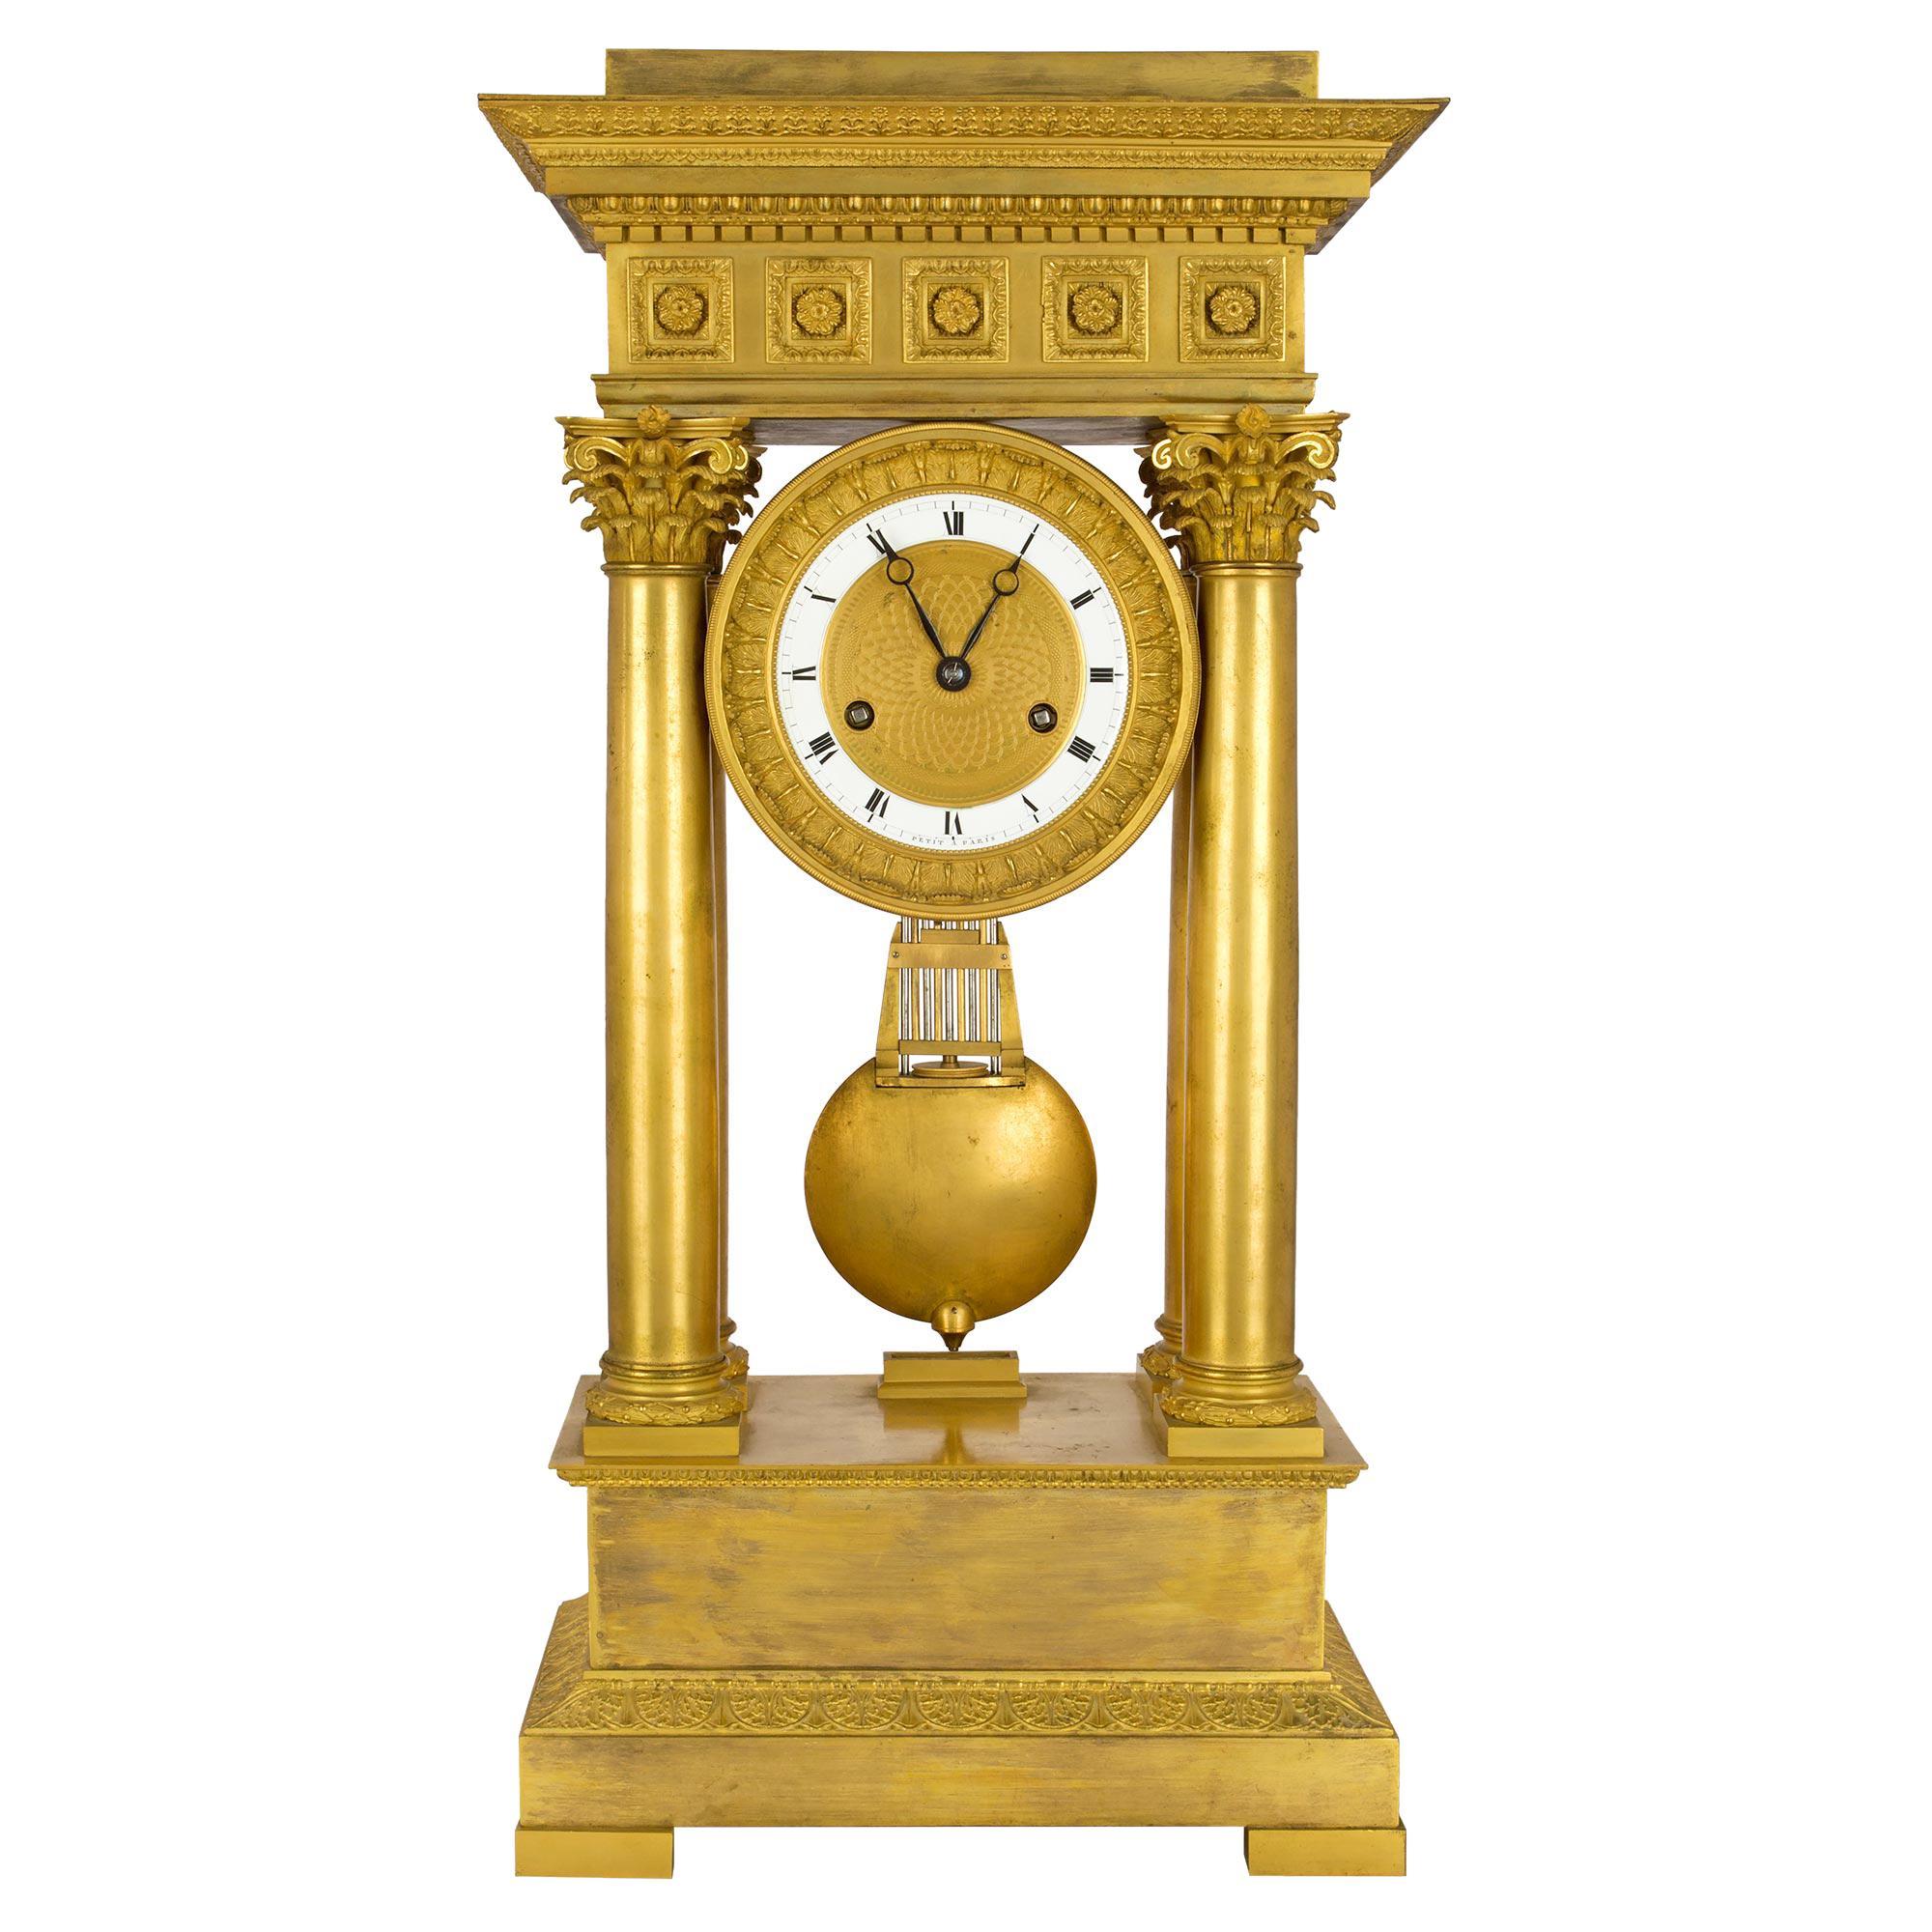 French Empire Style Mid-19th Century Ormolu Clock, Signed 'petit a Paris'